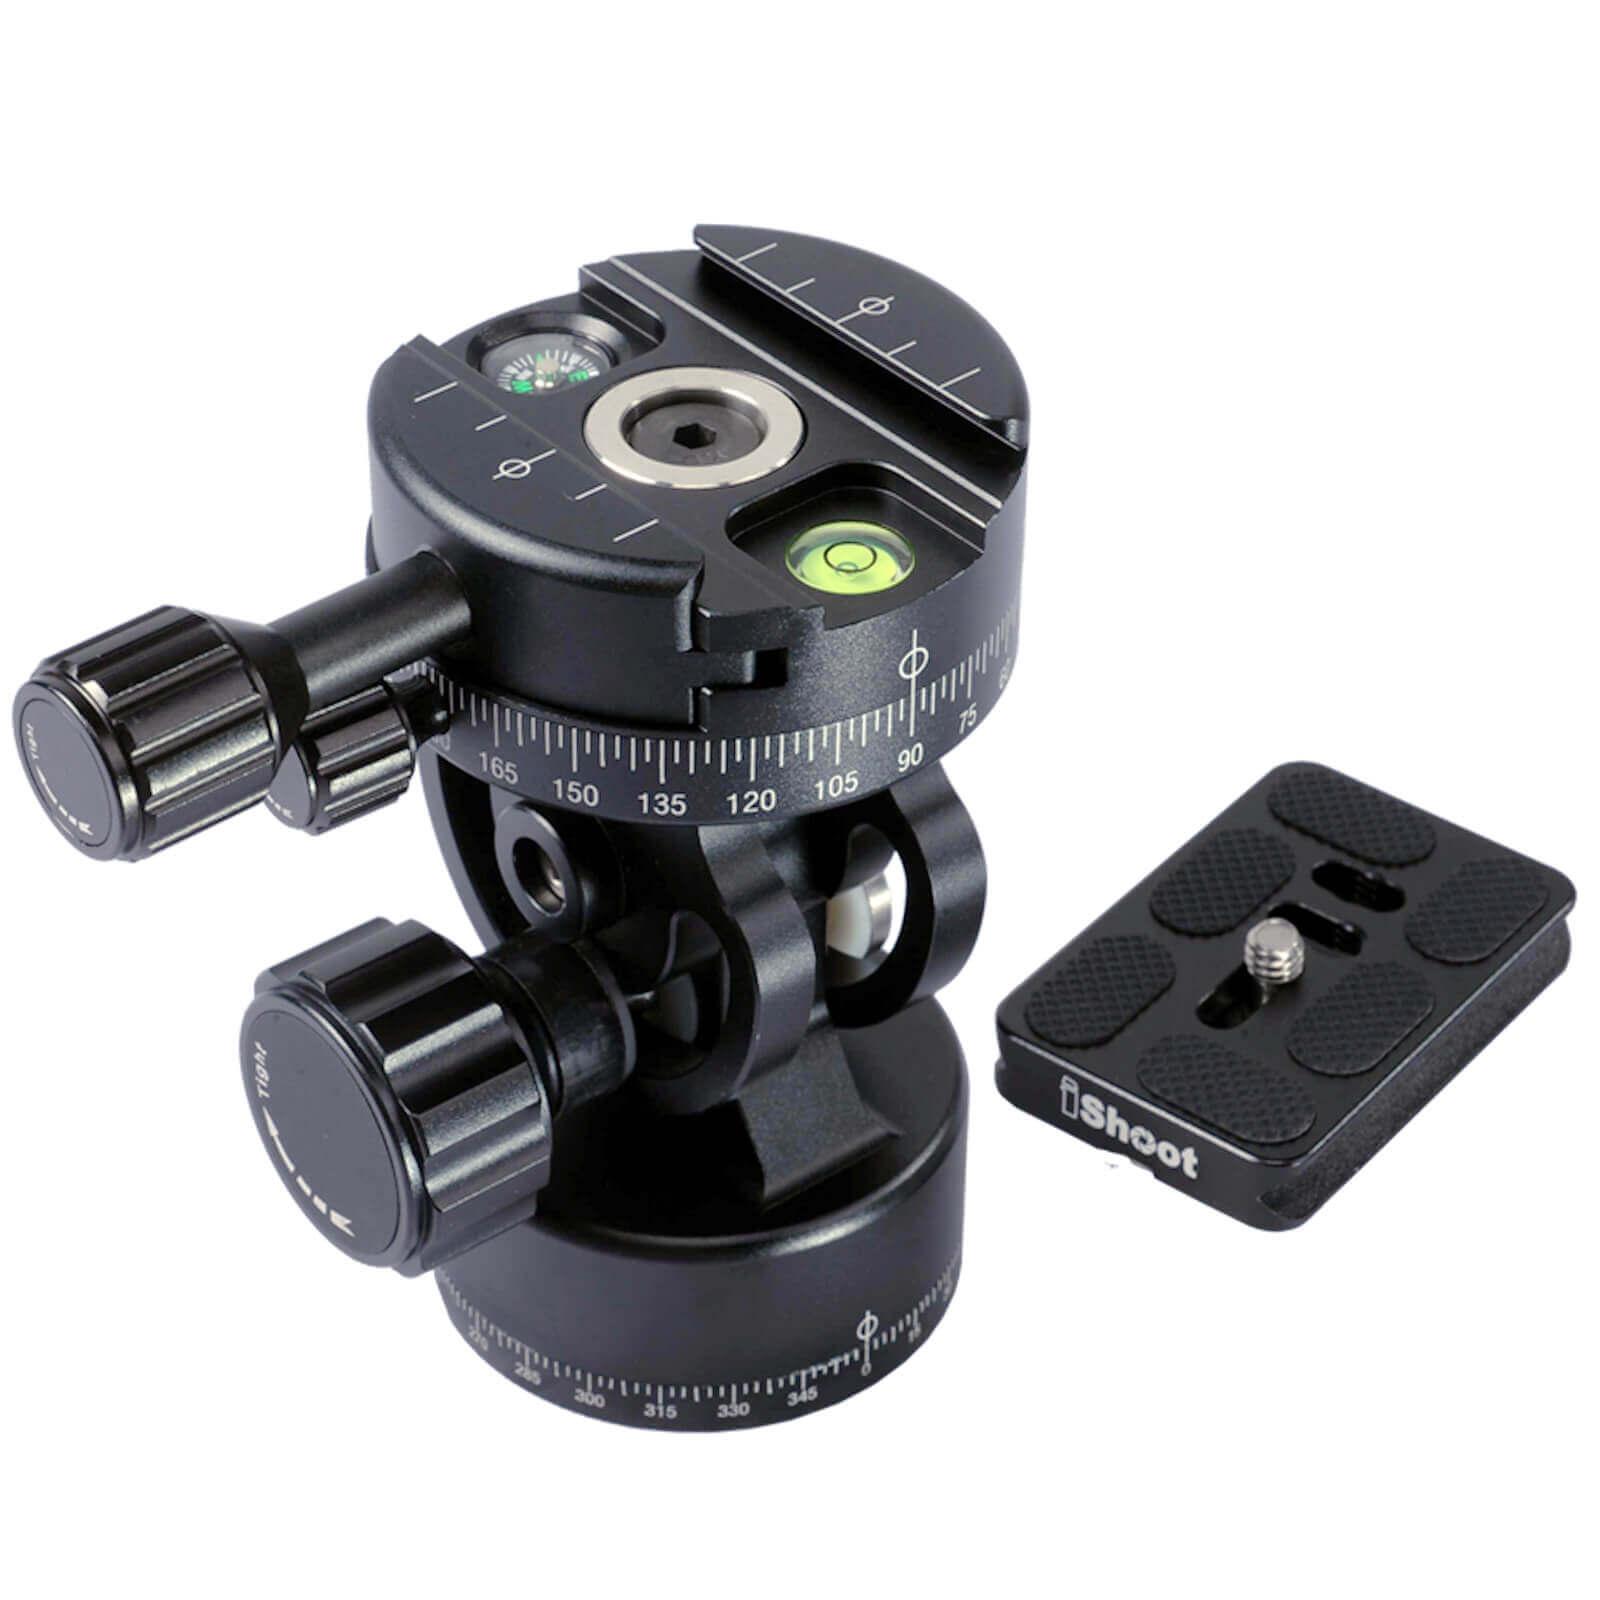 2D 360 Metal Panoramic Panorama Panning Ball Head Ballhead + Camera Quick Release Plate for Tripod -360 Head&Bottom -HOT ITEM